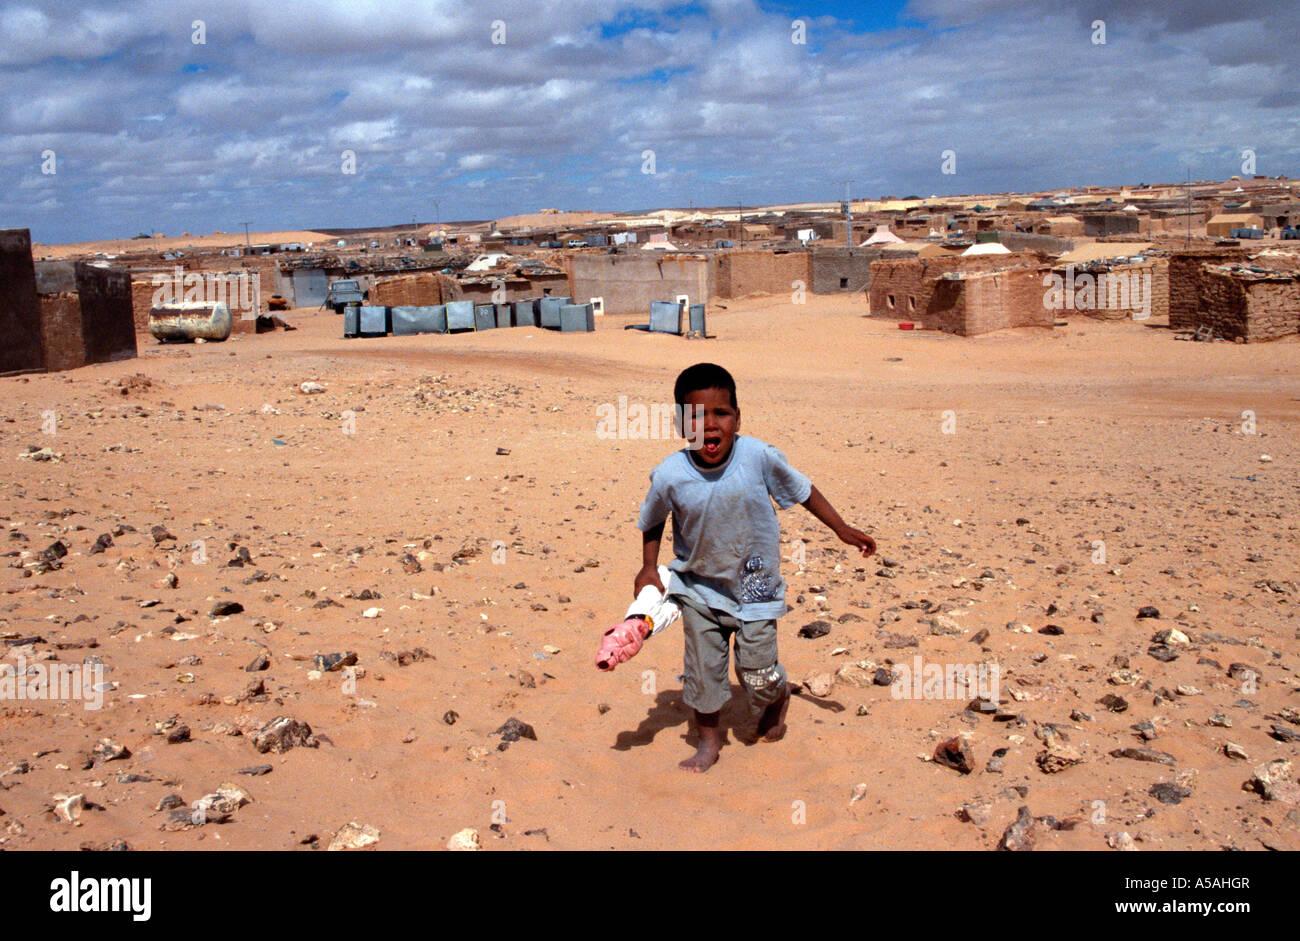 A Sahrawi boy at a refugee camp in Tindouf Western Algeria - Stock Image